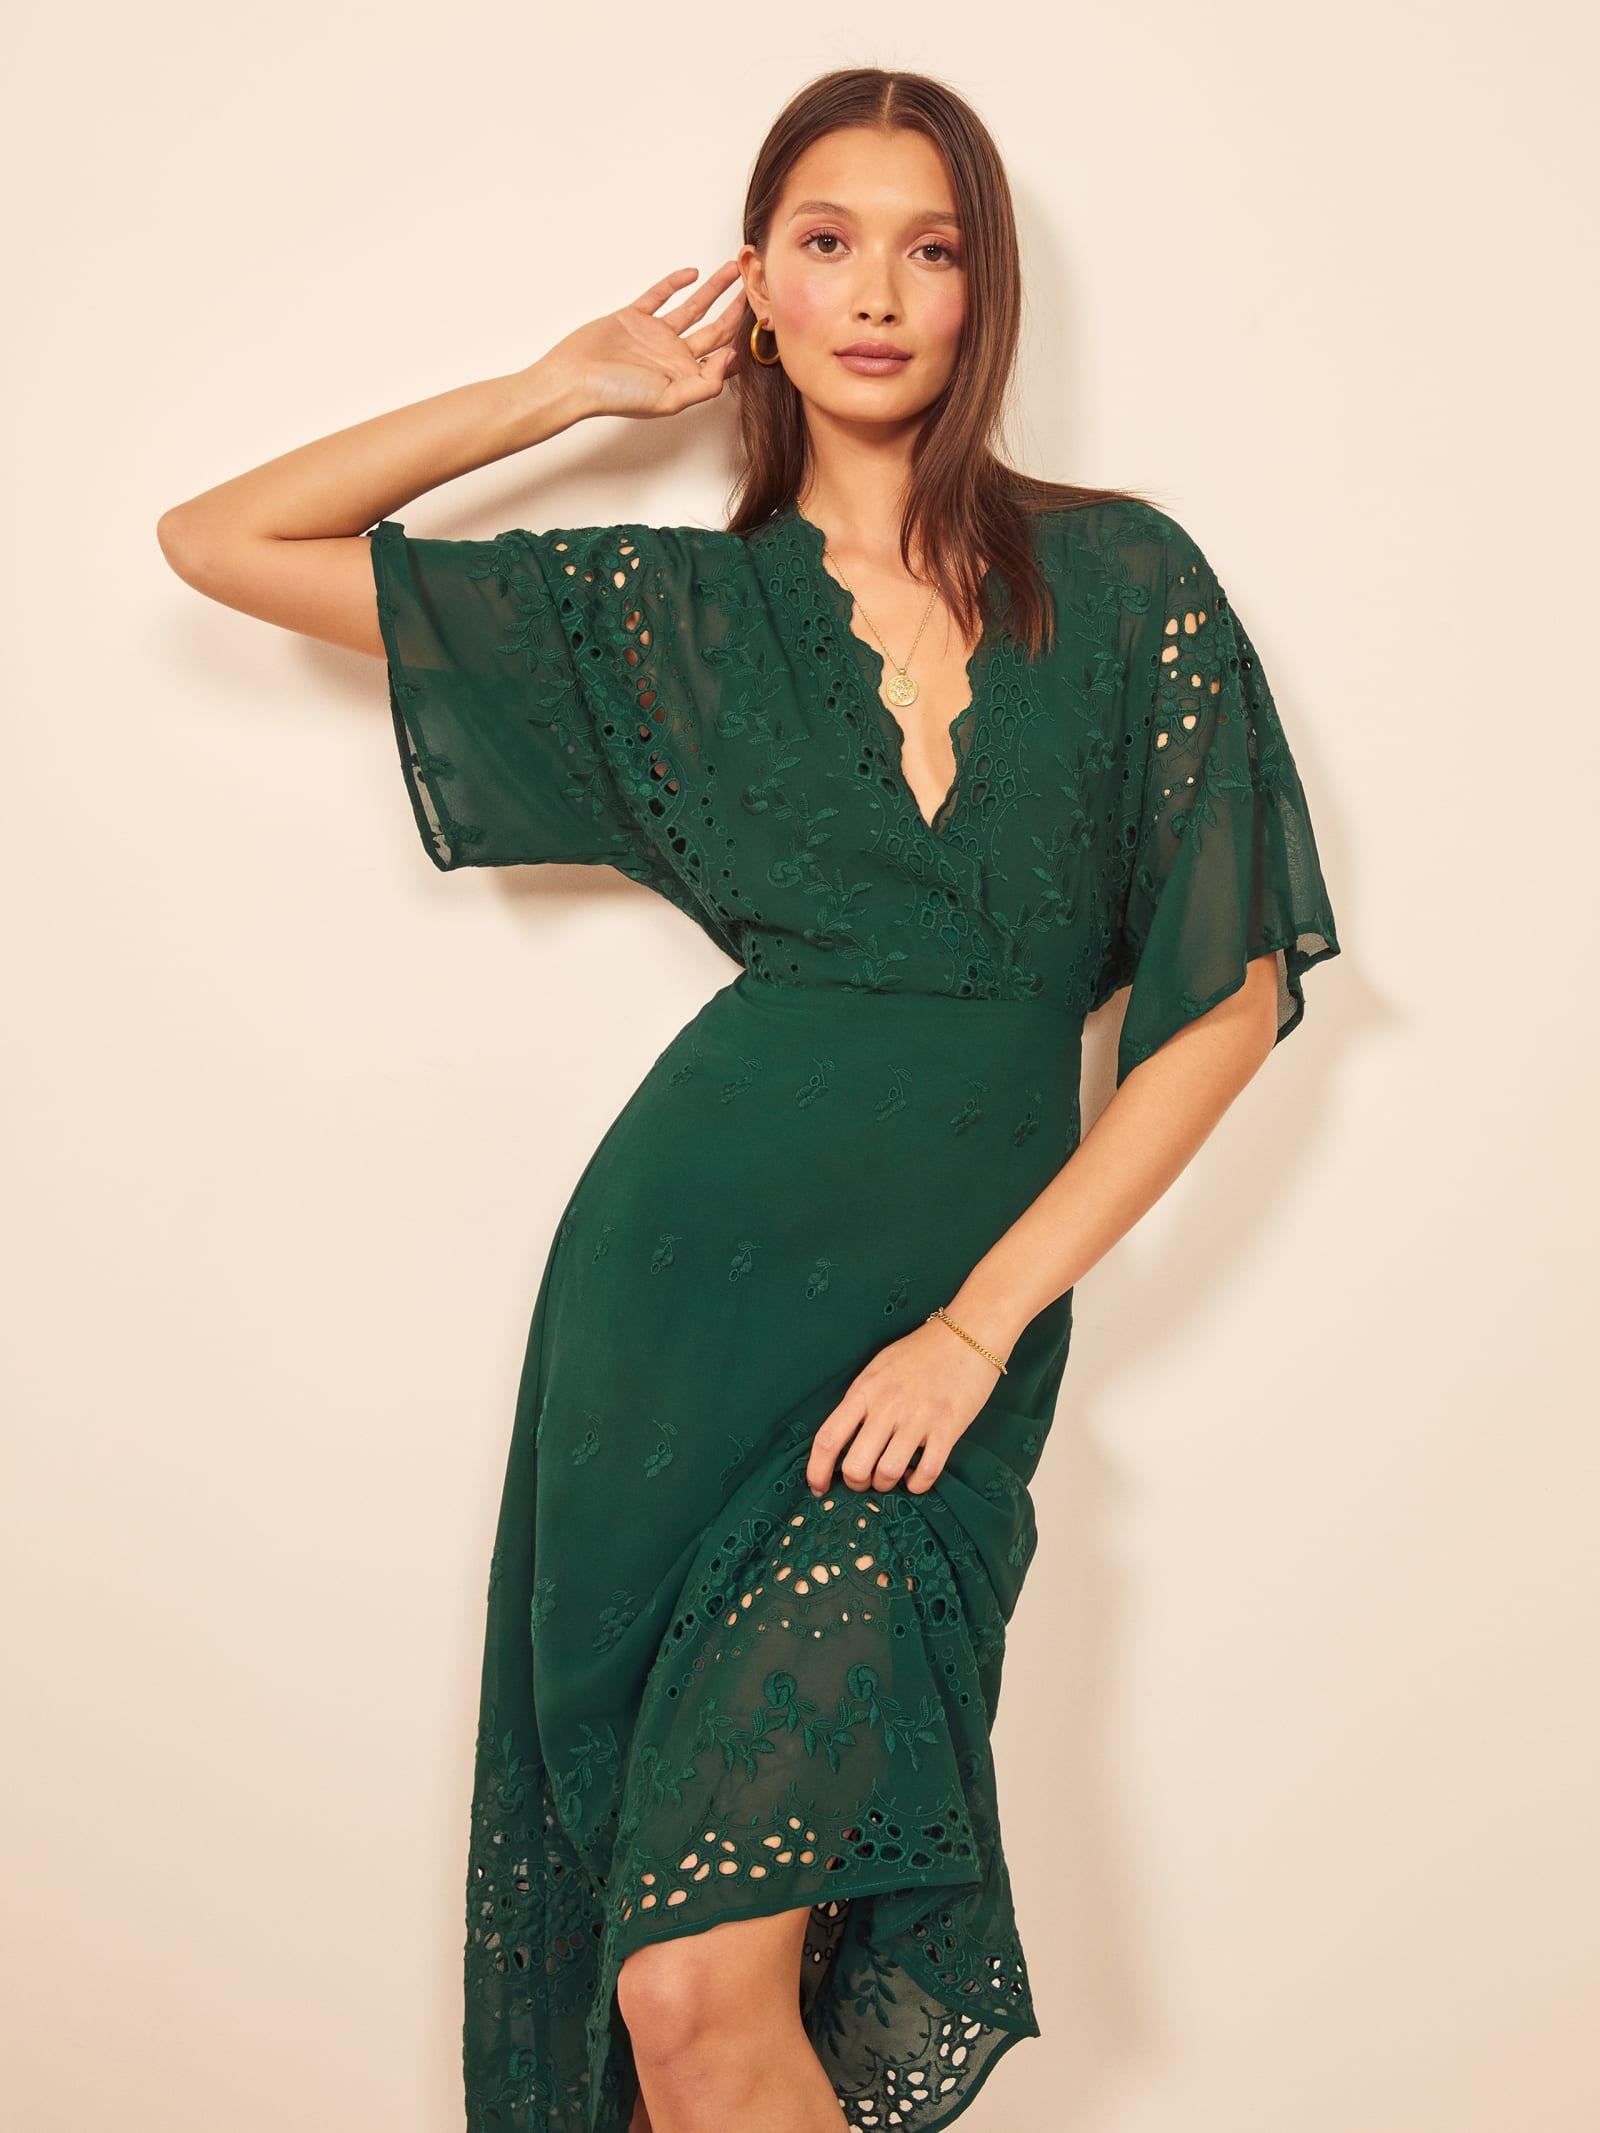 Ad Lib Dress | Coral Lingerie Slip Dress With Black Lace